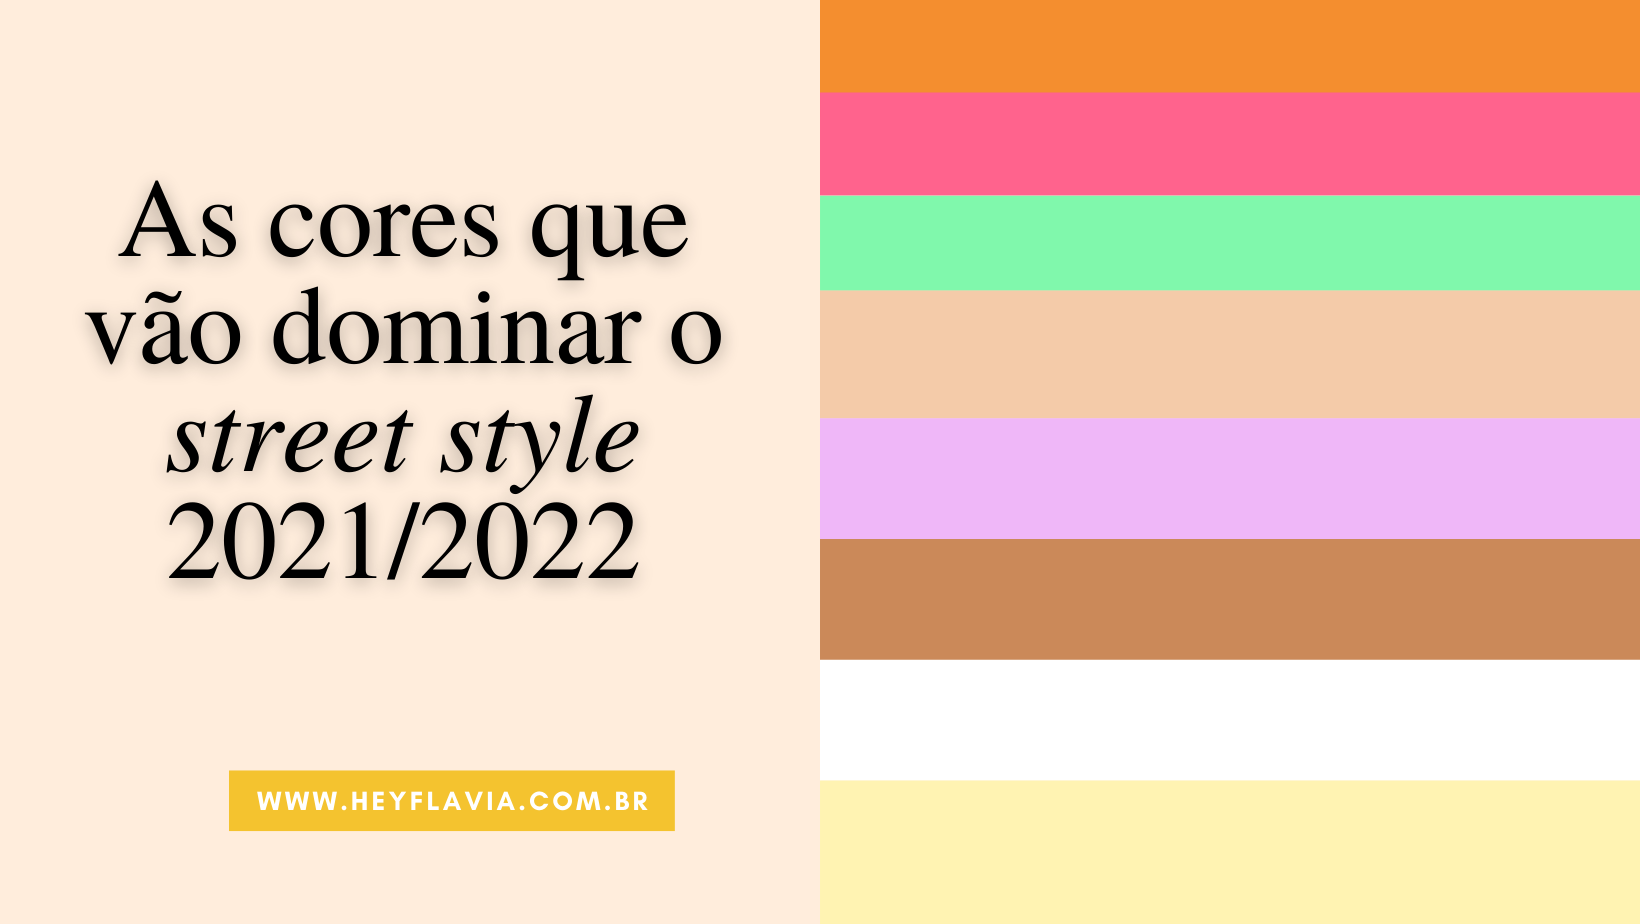 tendência de cores para 2022